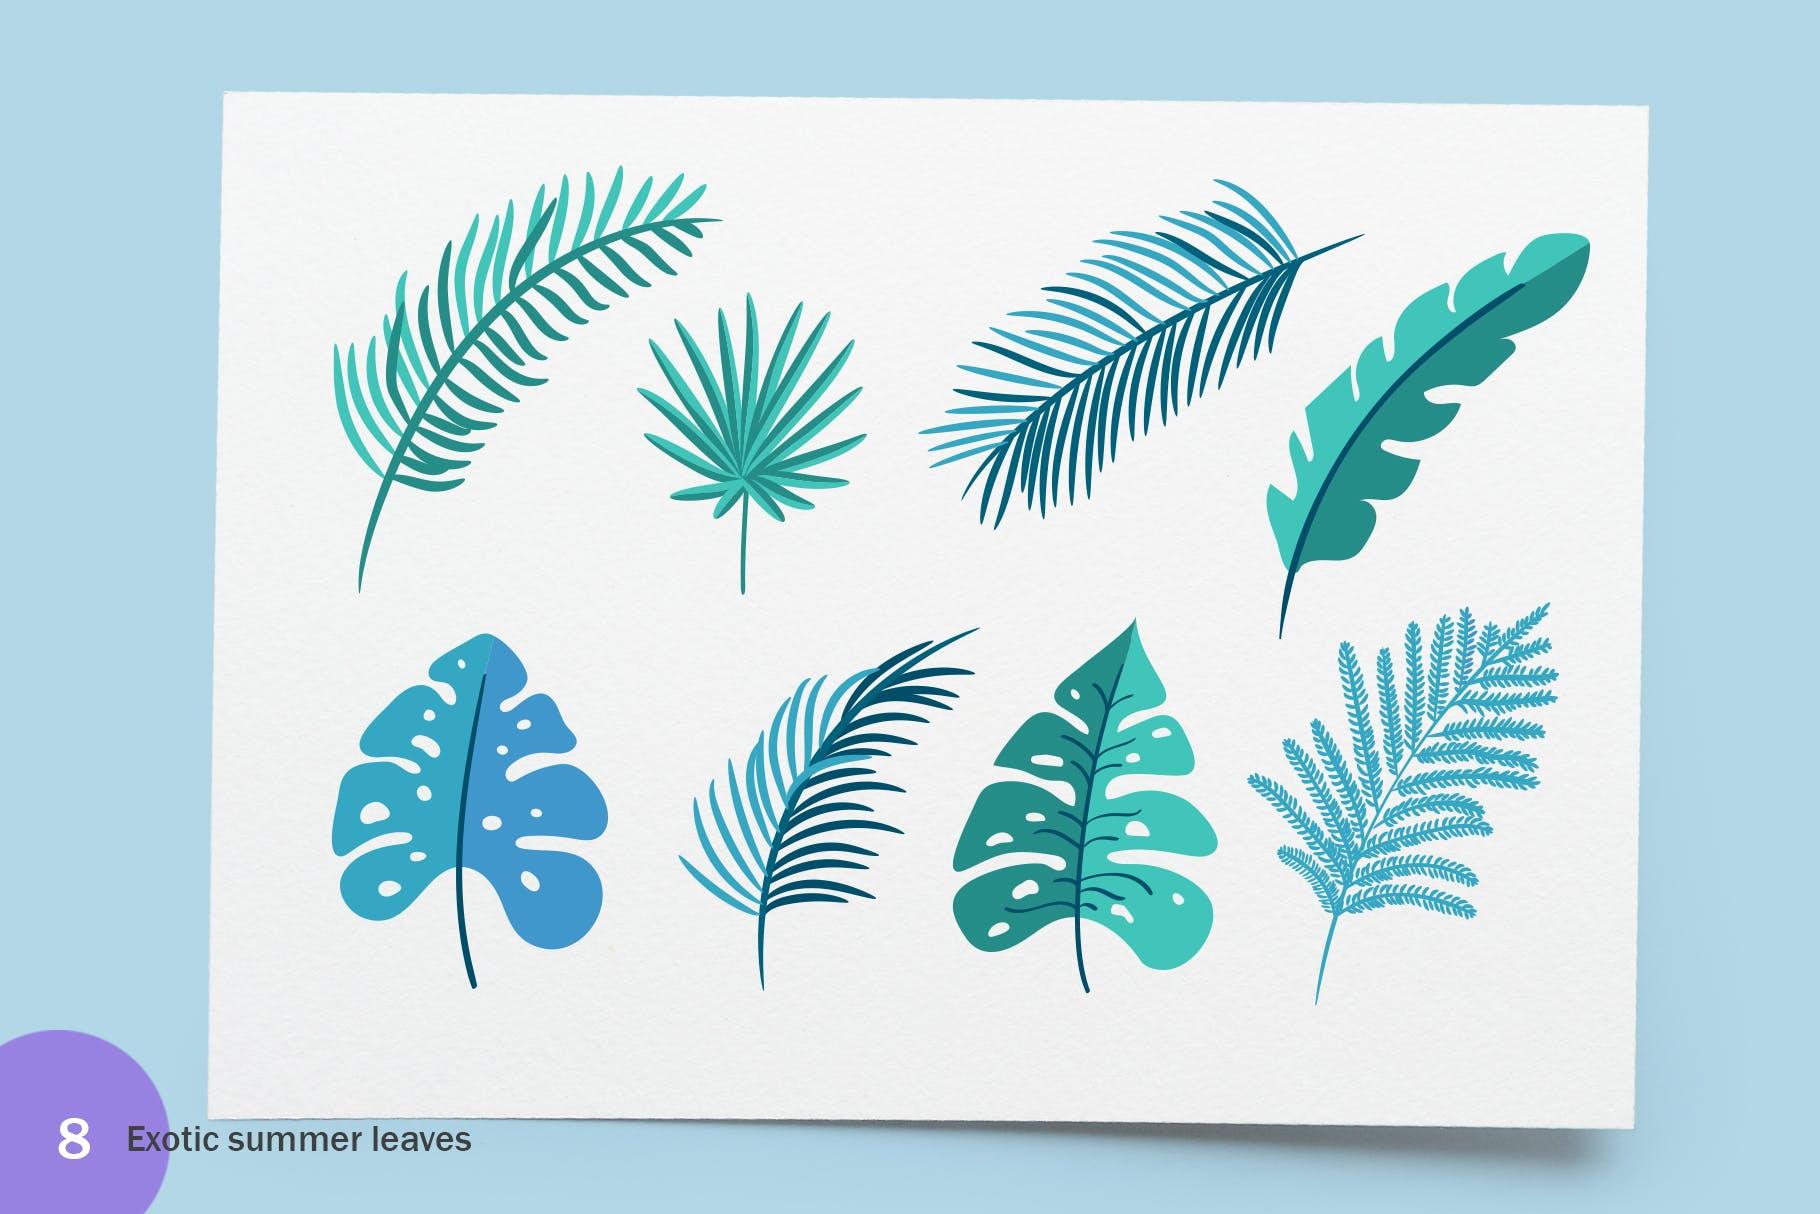 6个夏季无缝矢量图案素材图案纹理Summer Exotic Palm Design Elements SVG插图(5)